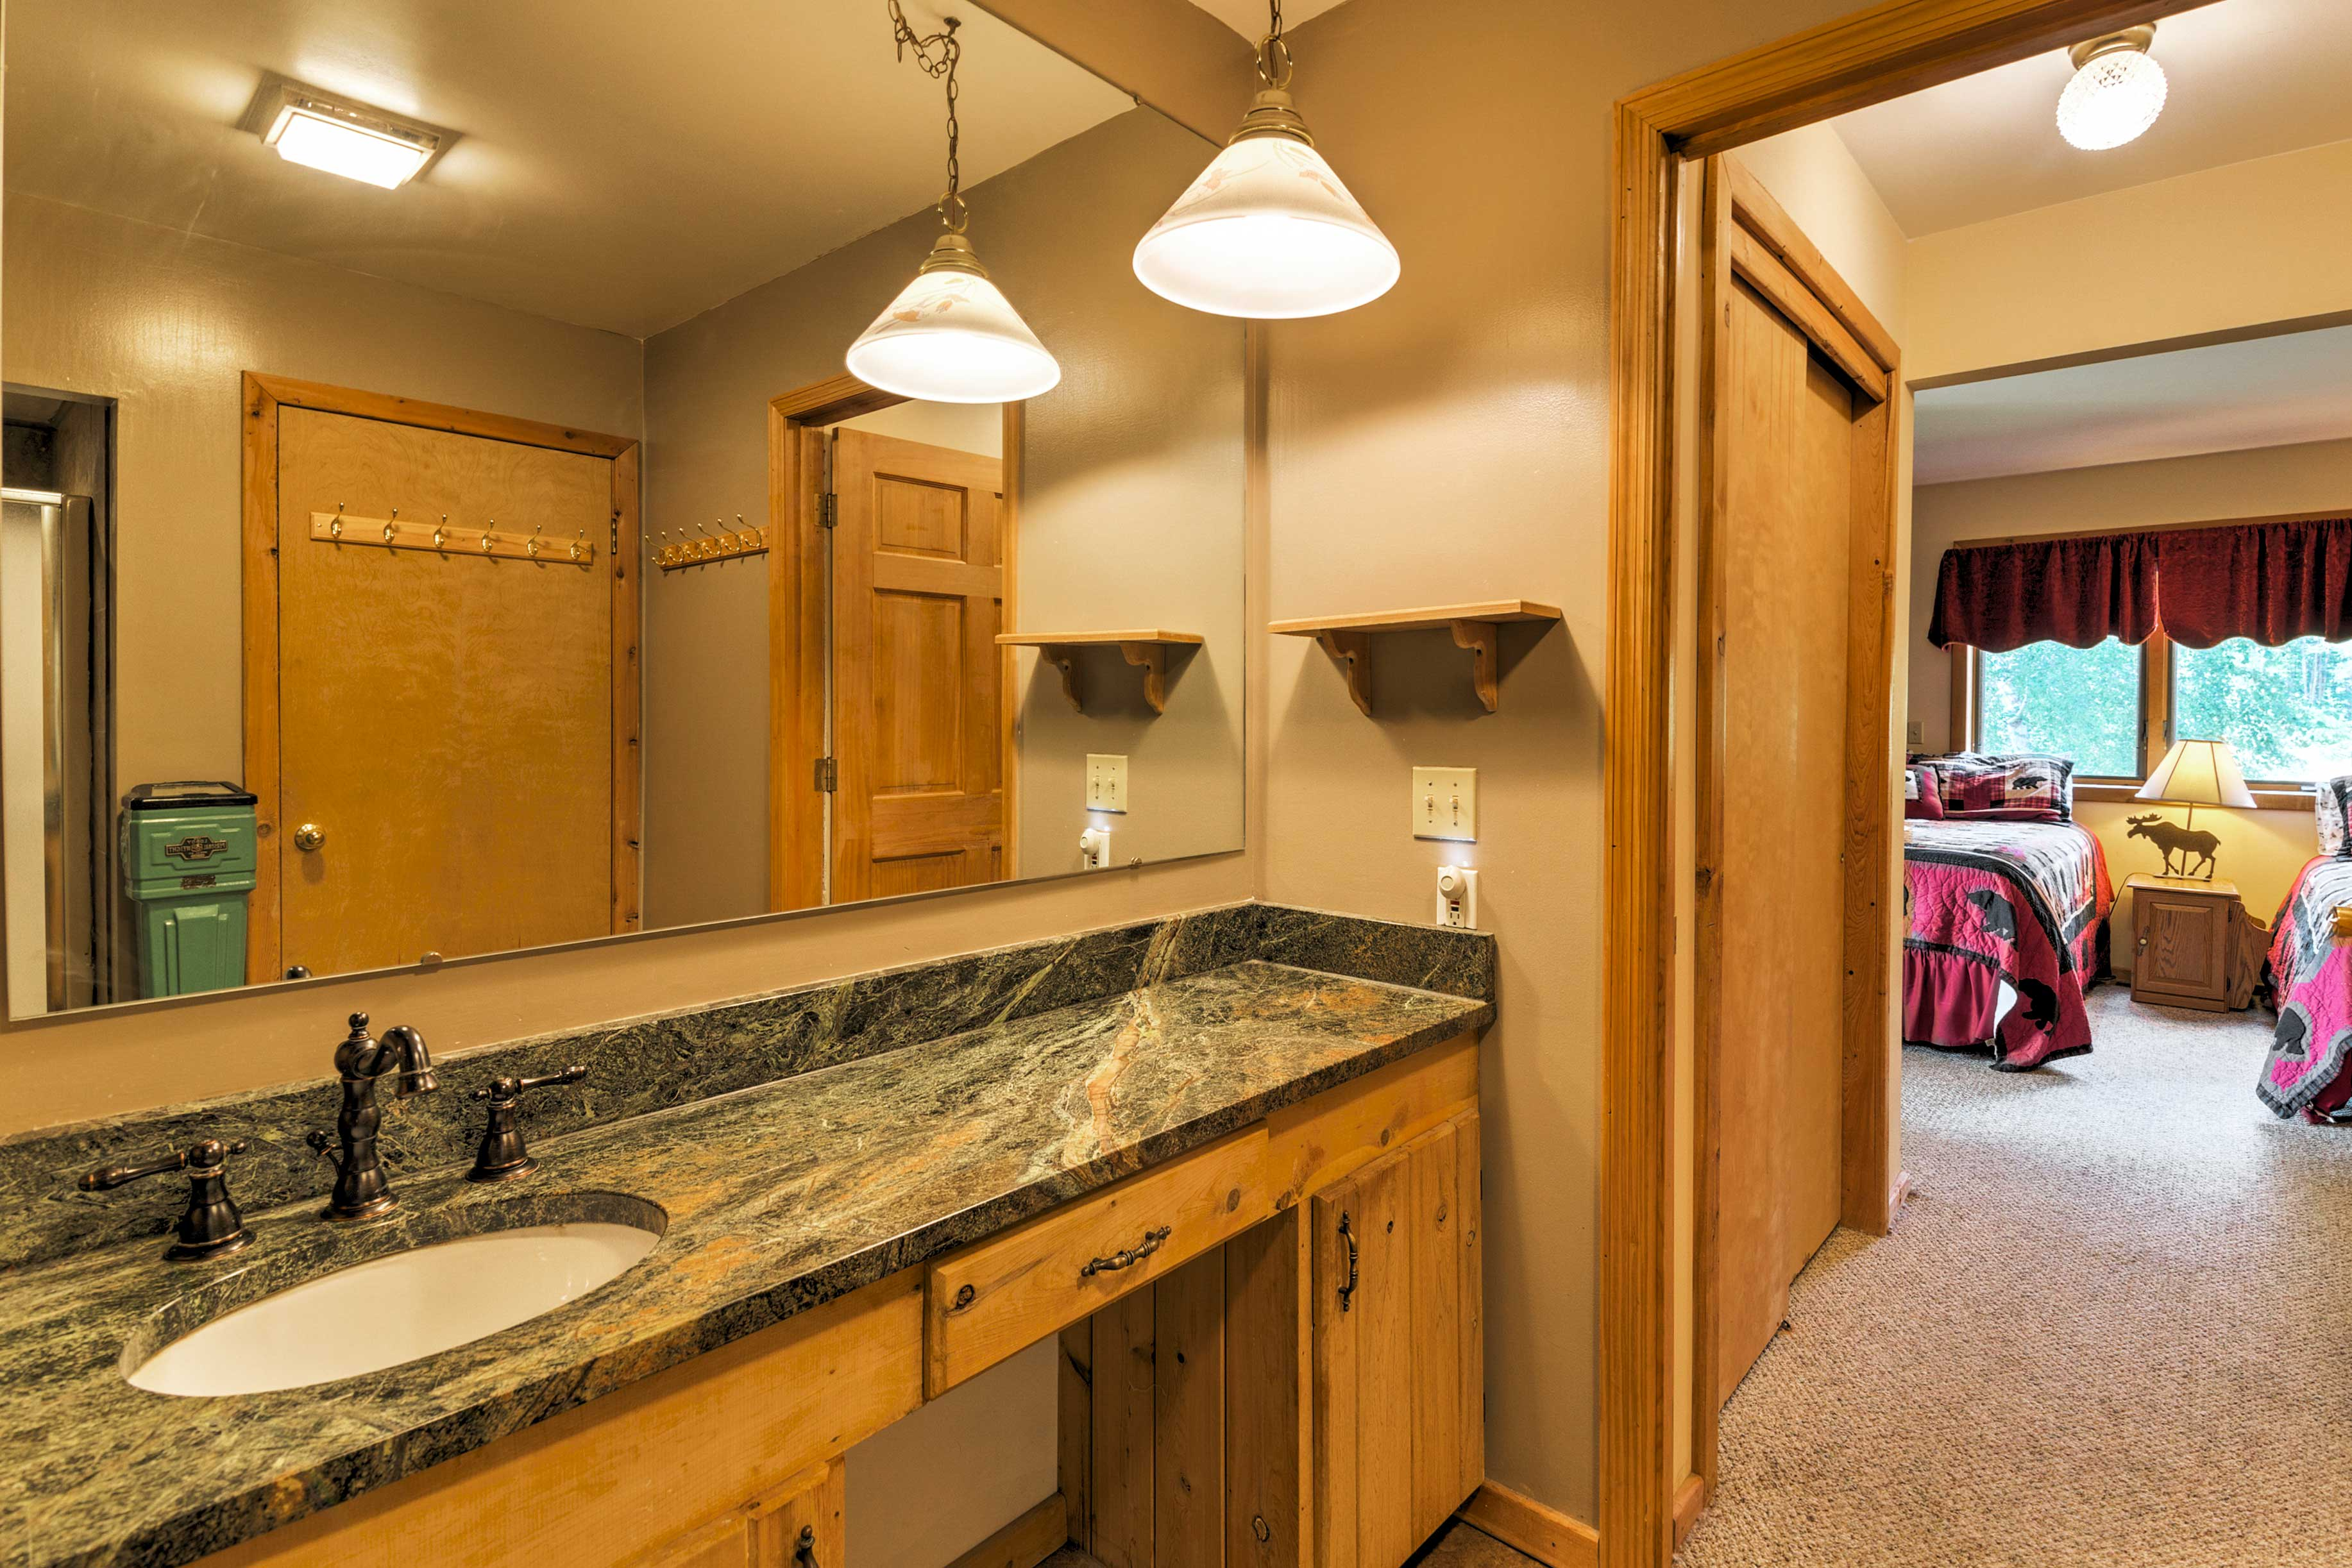 The bathroom also features beautiful granite countertops.